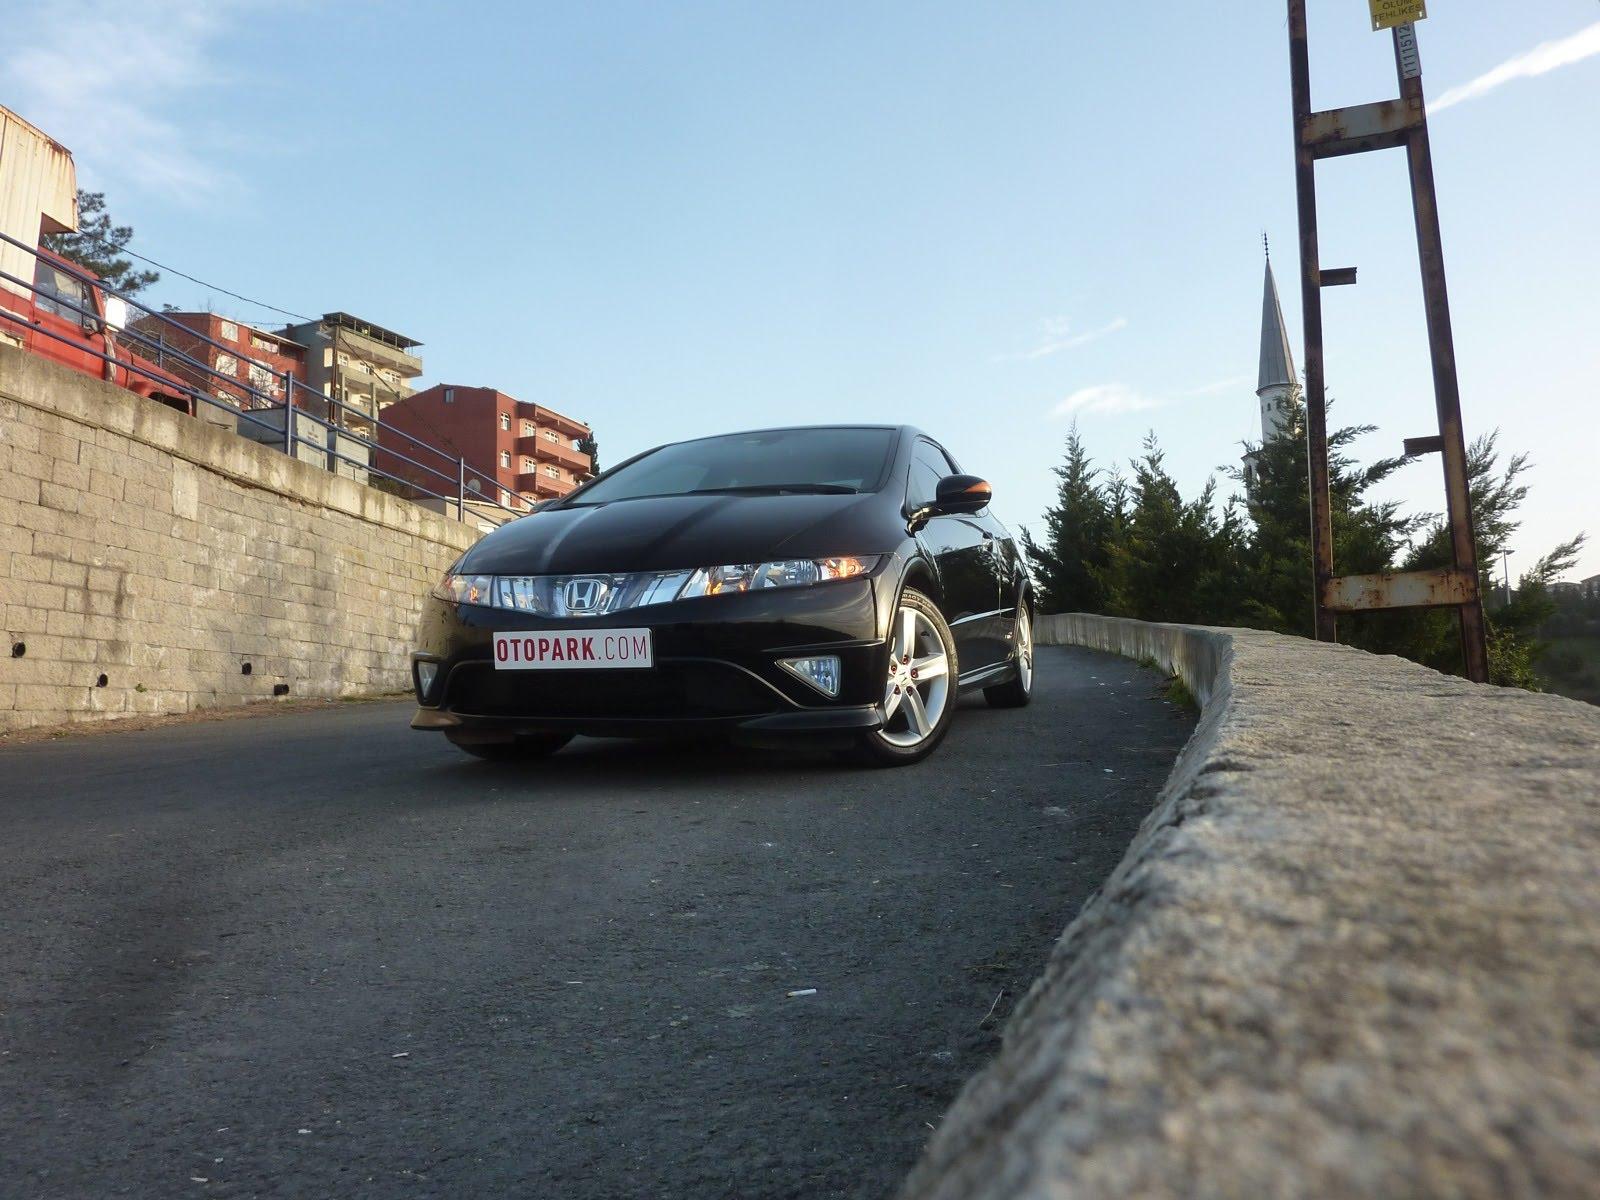 Photo of Honda Civic testi (2. kamera arkası)